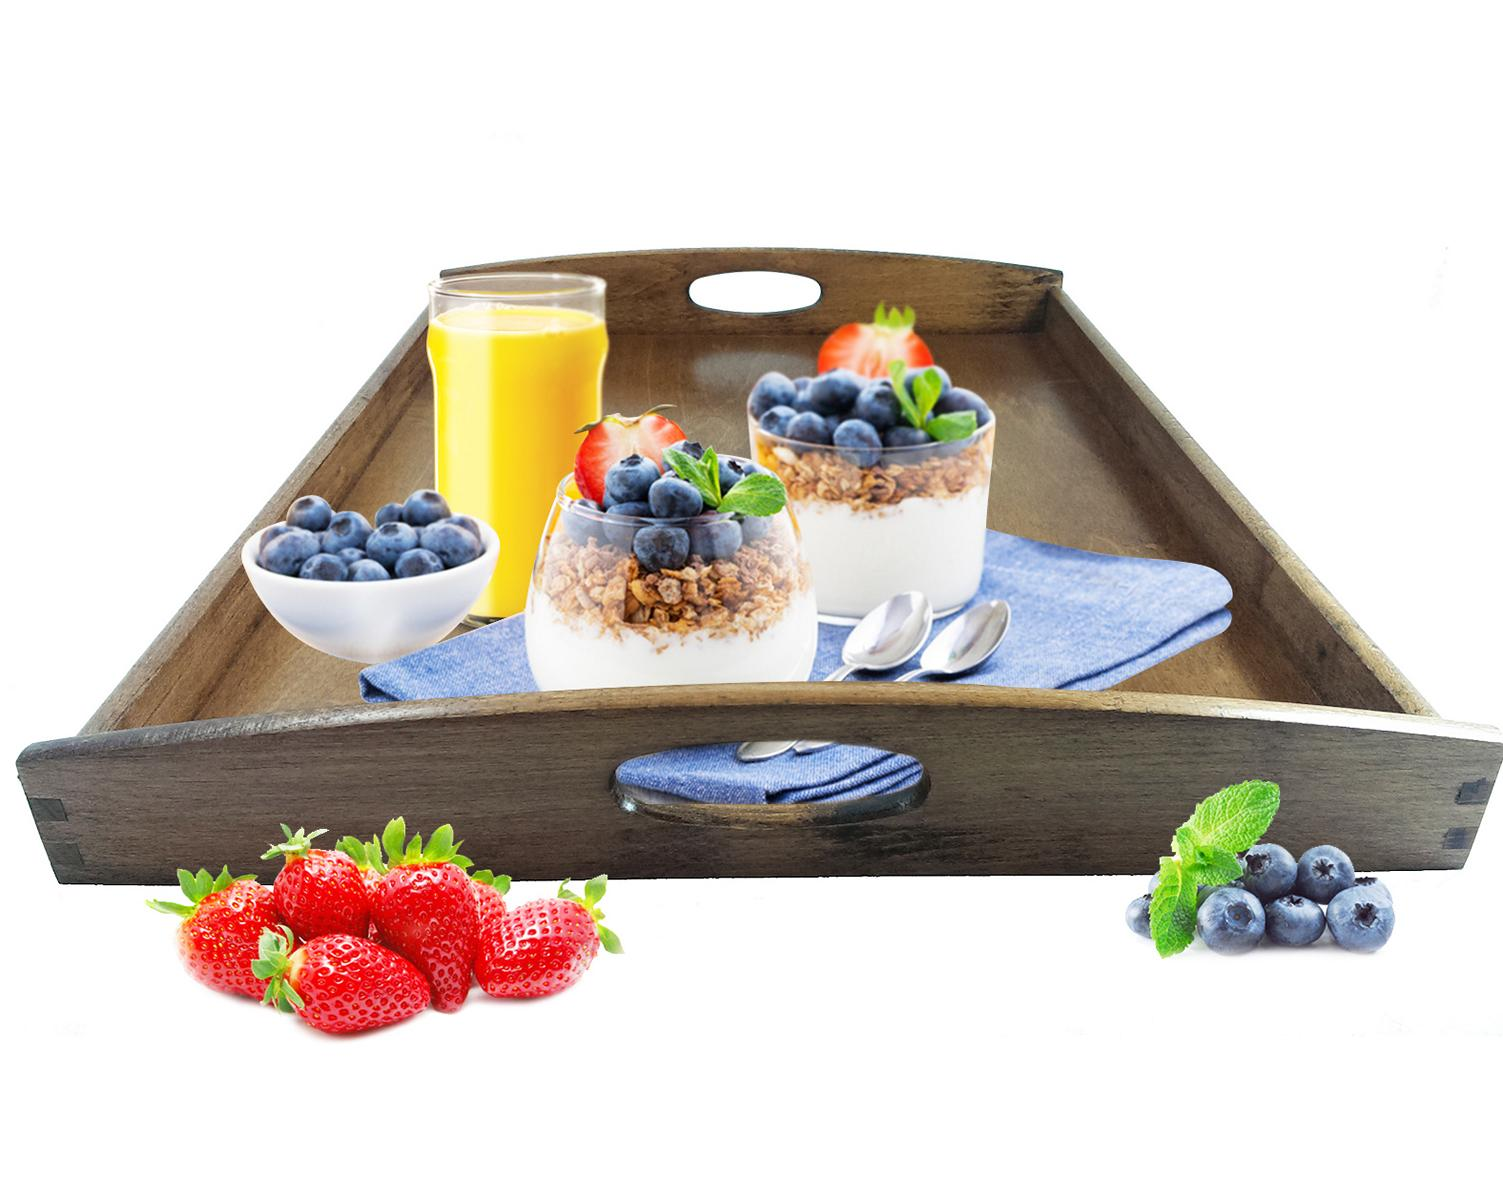 Frühstückstablett serviertablett dunkel holztablett betttablett frühstückstablett